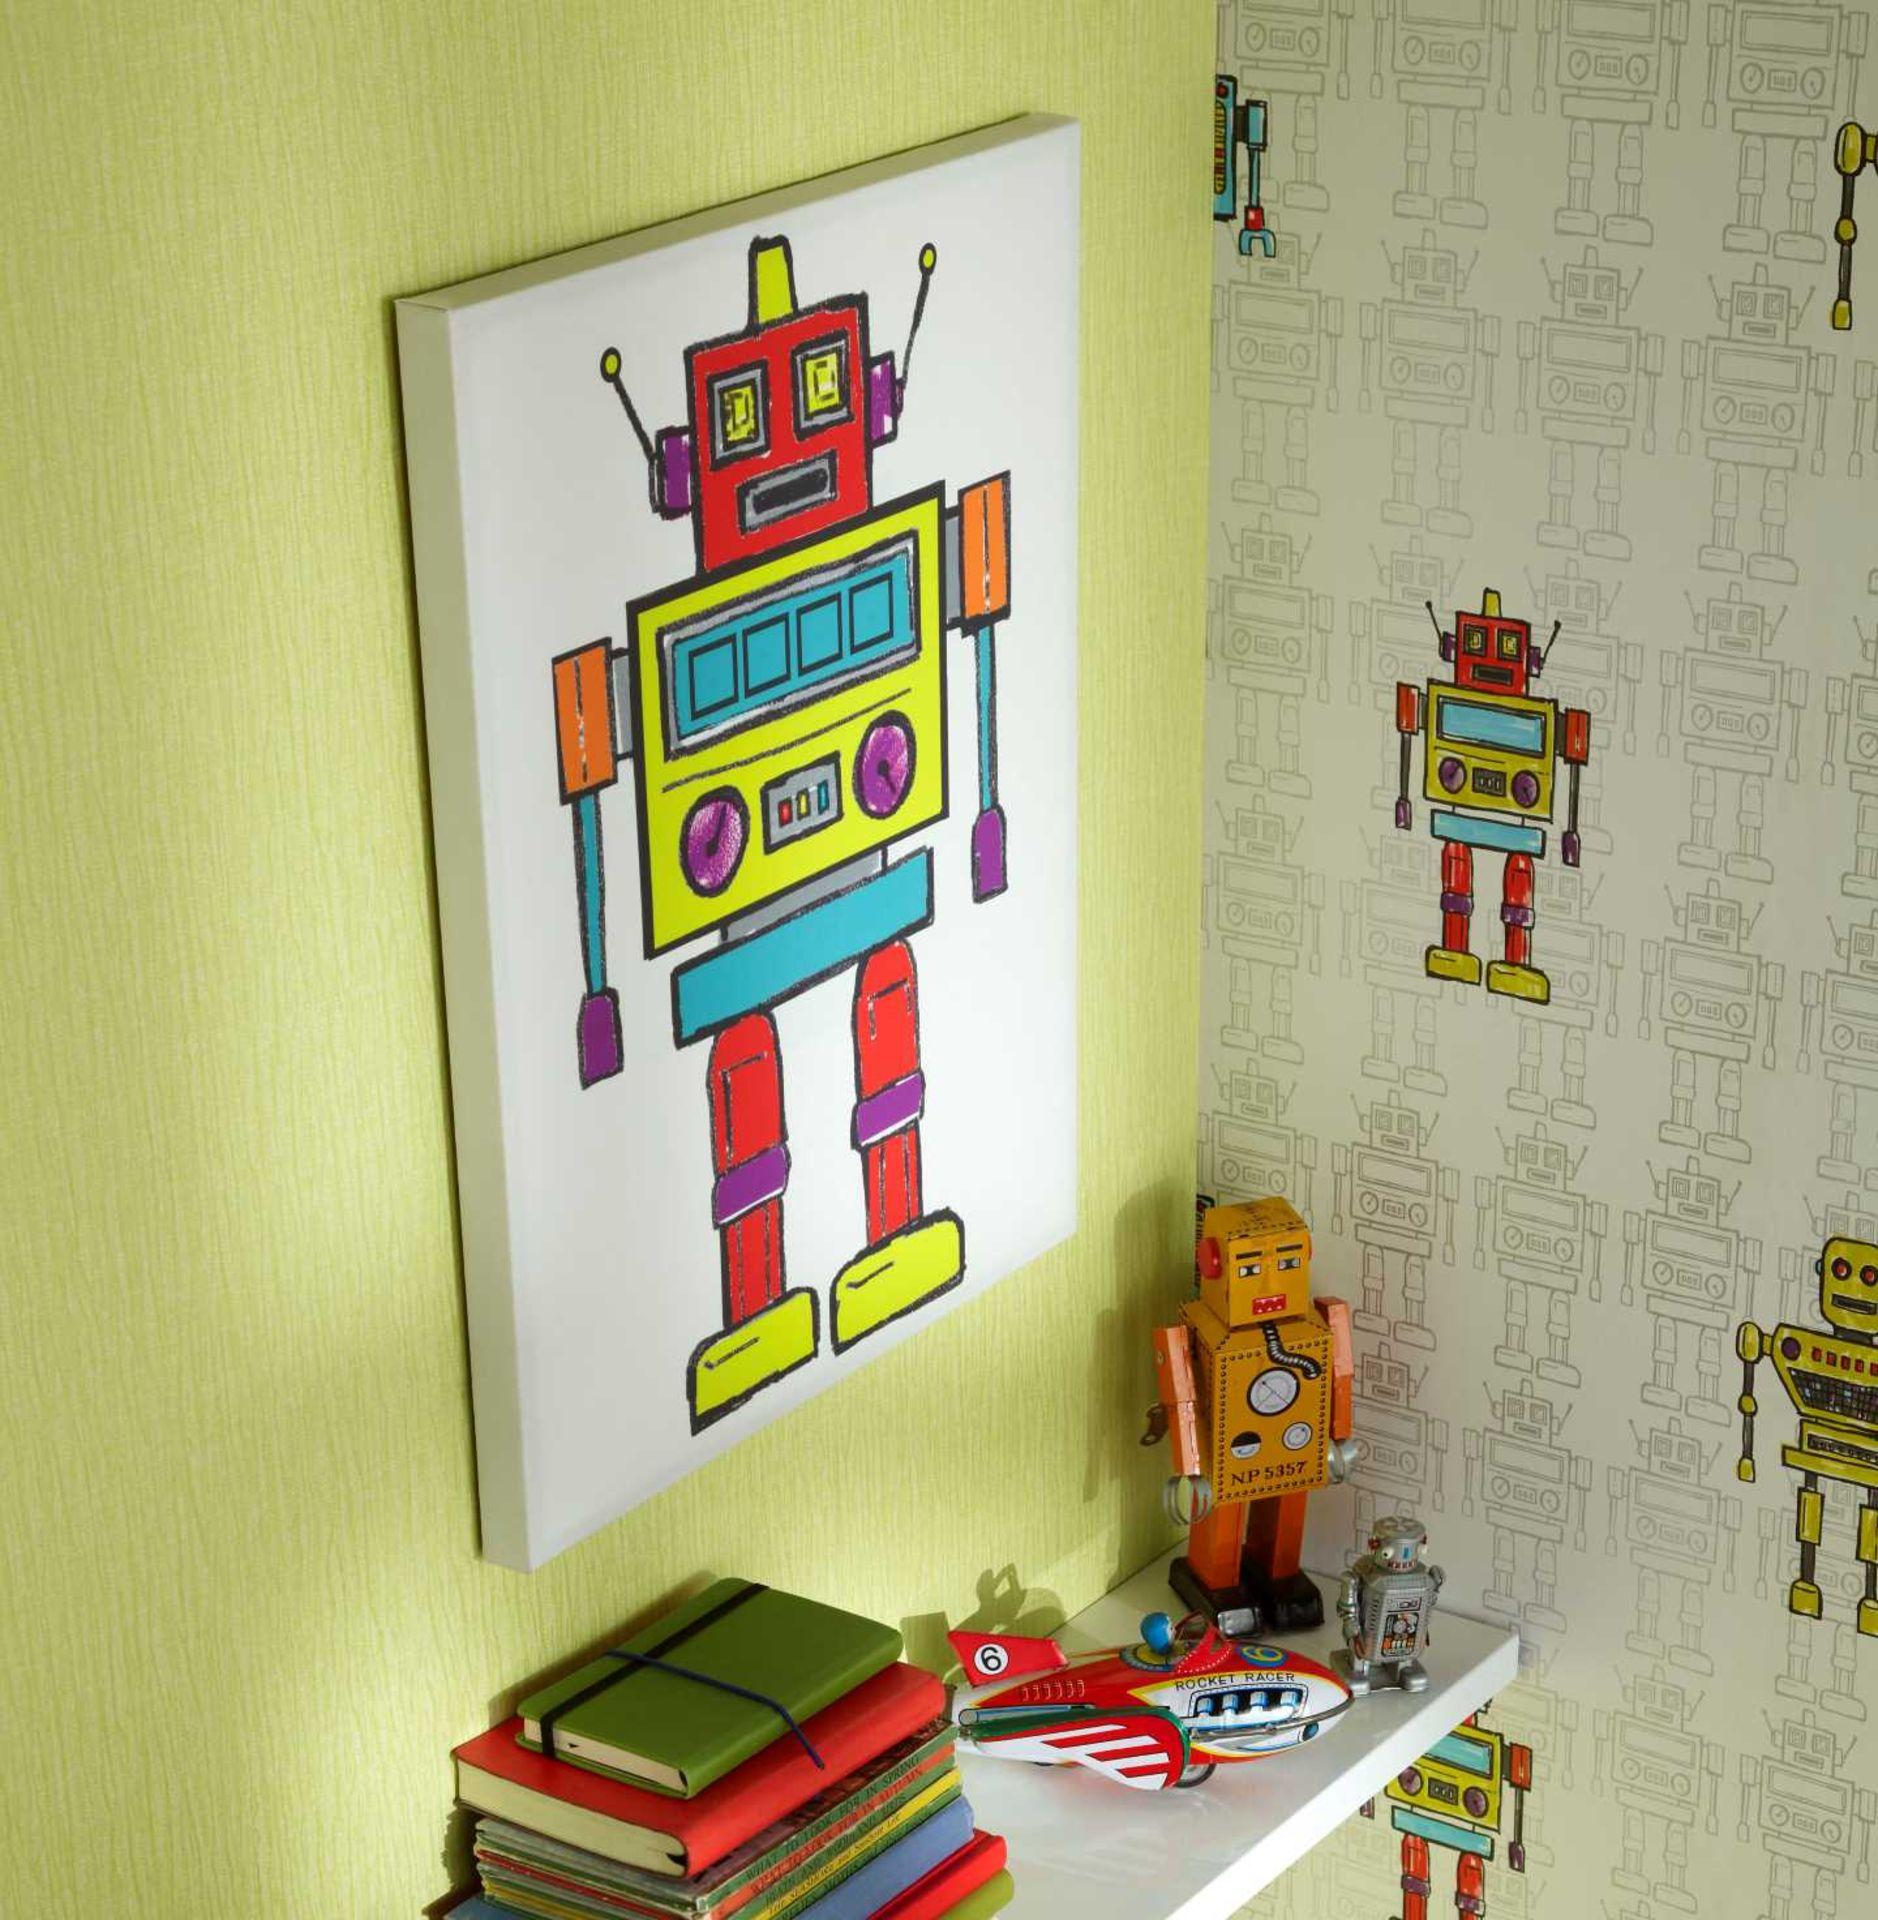 Lot 24 - 56 Arthouse Arthouse Robots LED Canvas